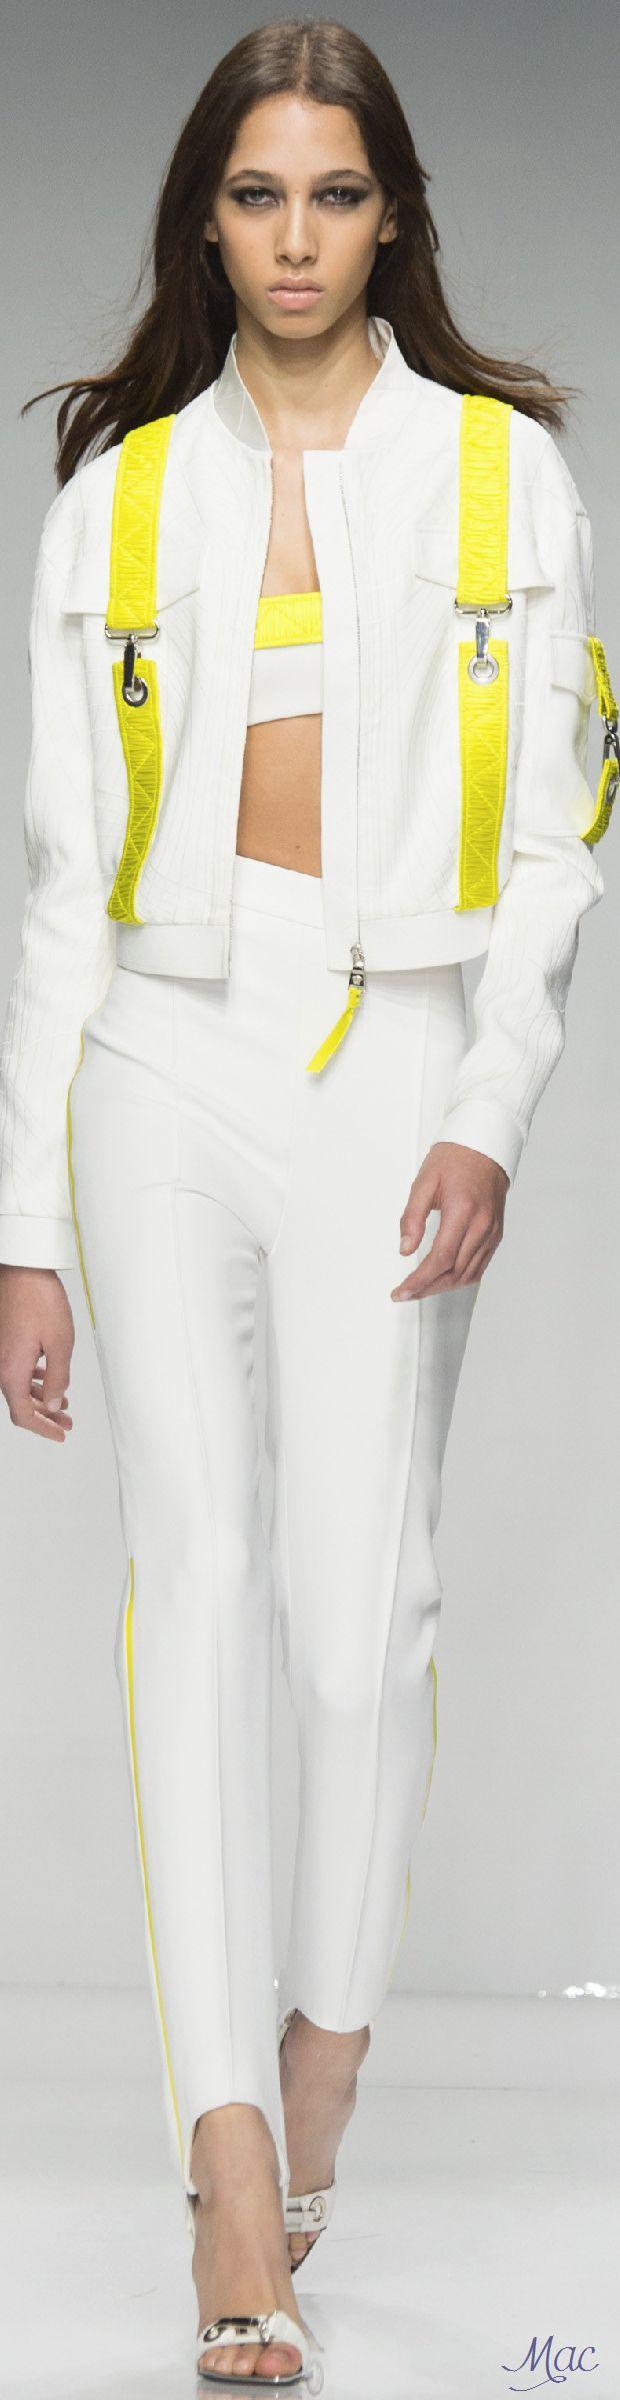 Spring 2016 Haute Couture Atelier Versace